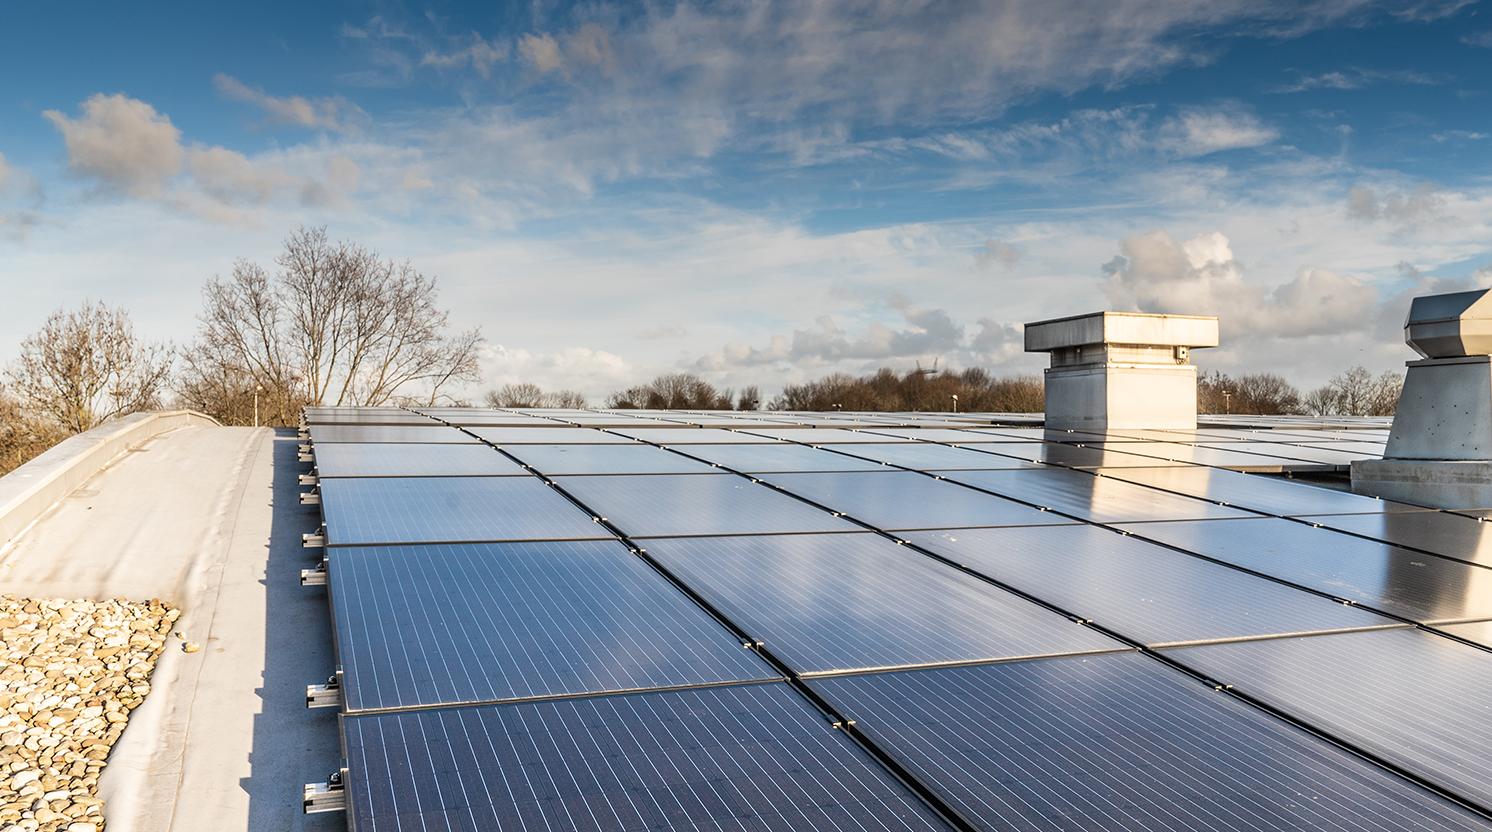 Jual Solar ballastvrij montagesysteem op rond gebogen stalen bitumen dak